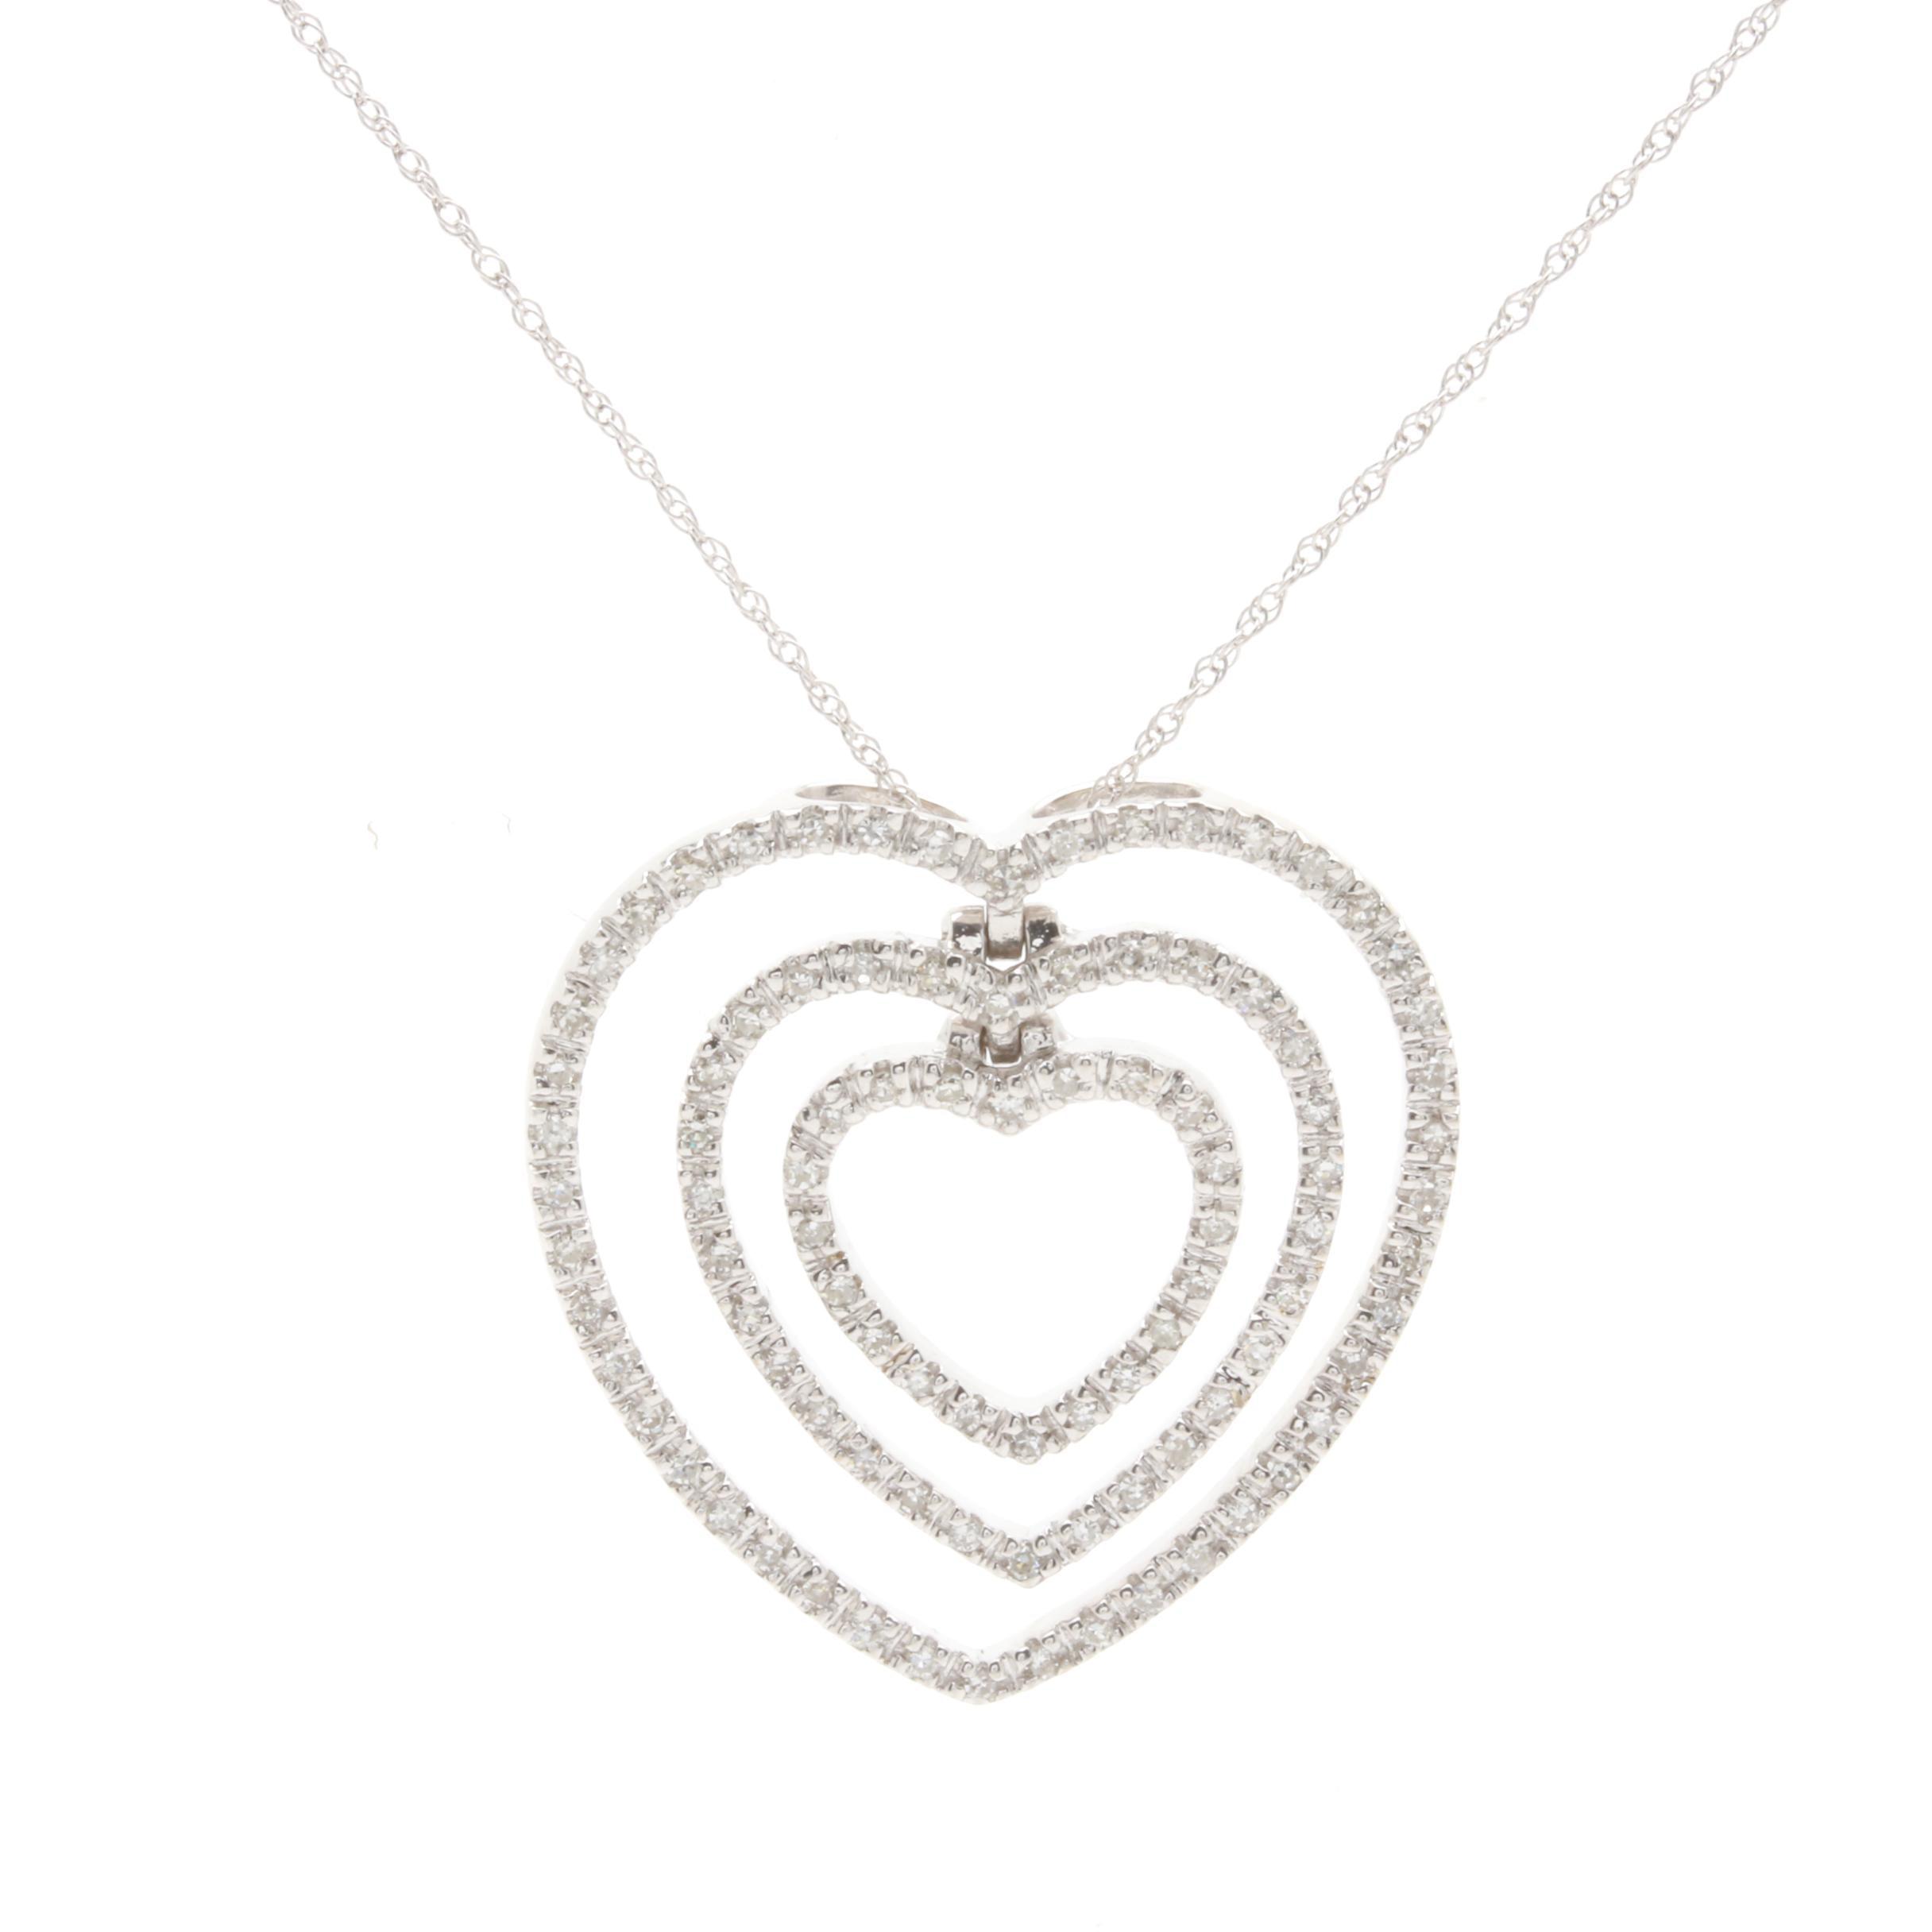 10K and 14K White Gold Diamond Heart Pendant Necklace